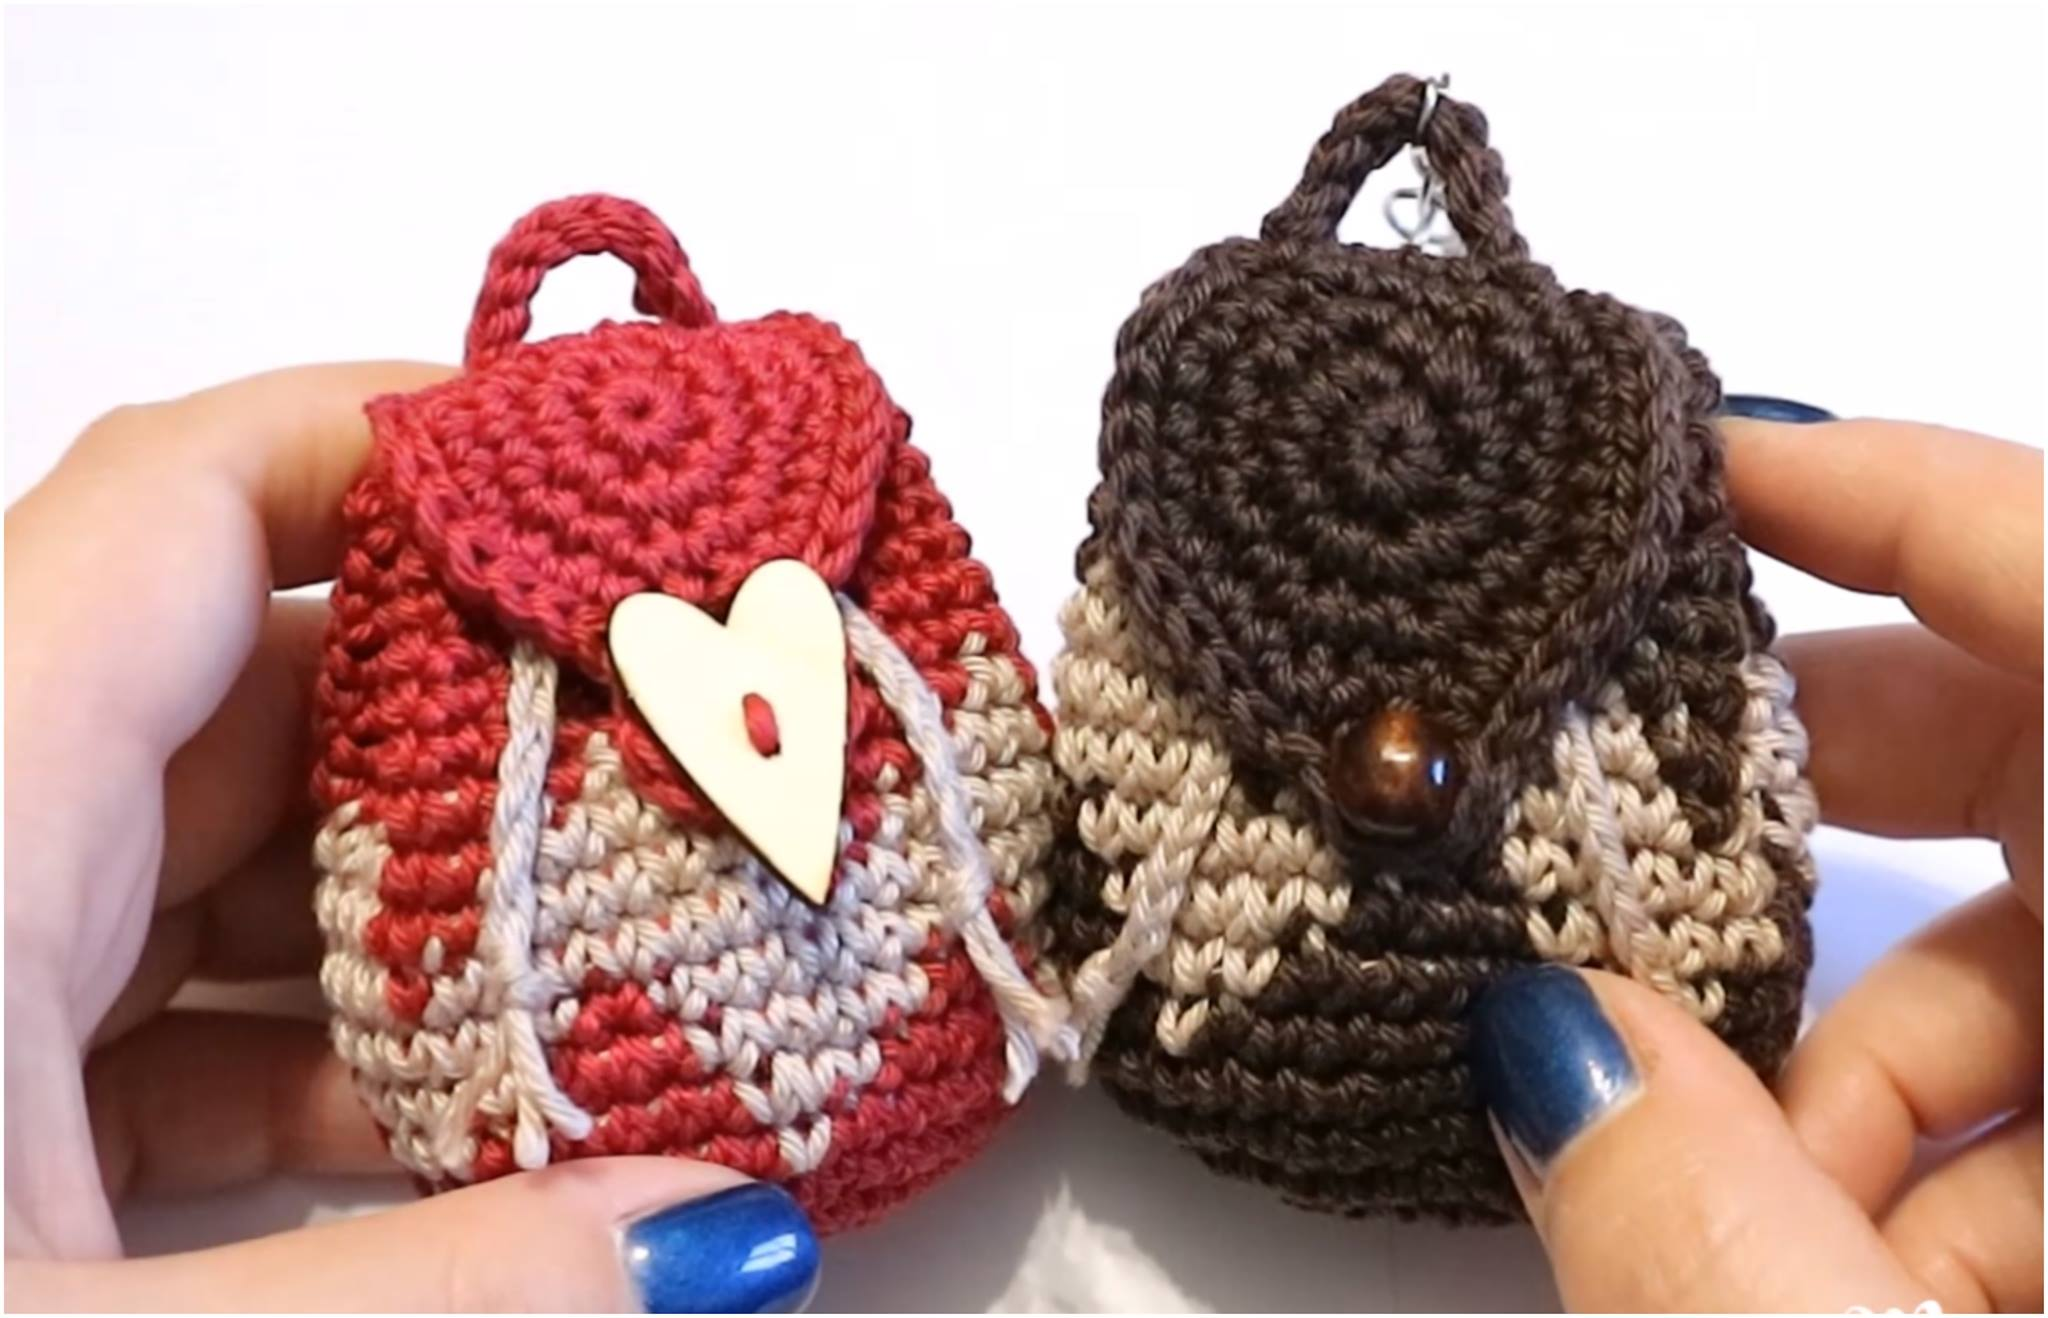 Cute and Fun Keychain Crochet Patterns | Crochet dolls free ... | 1318x2048